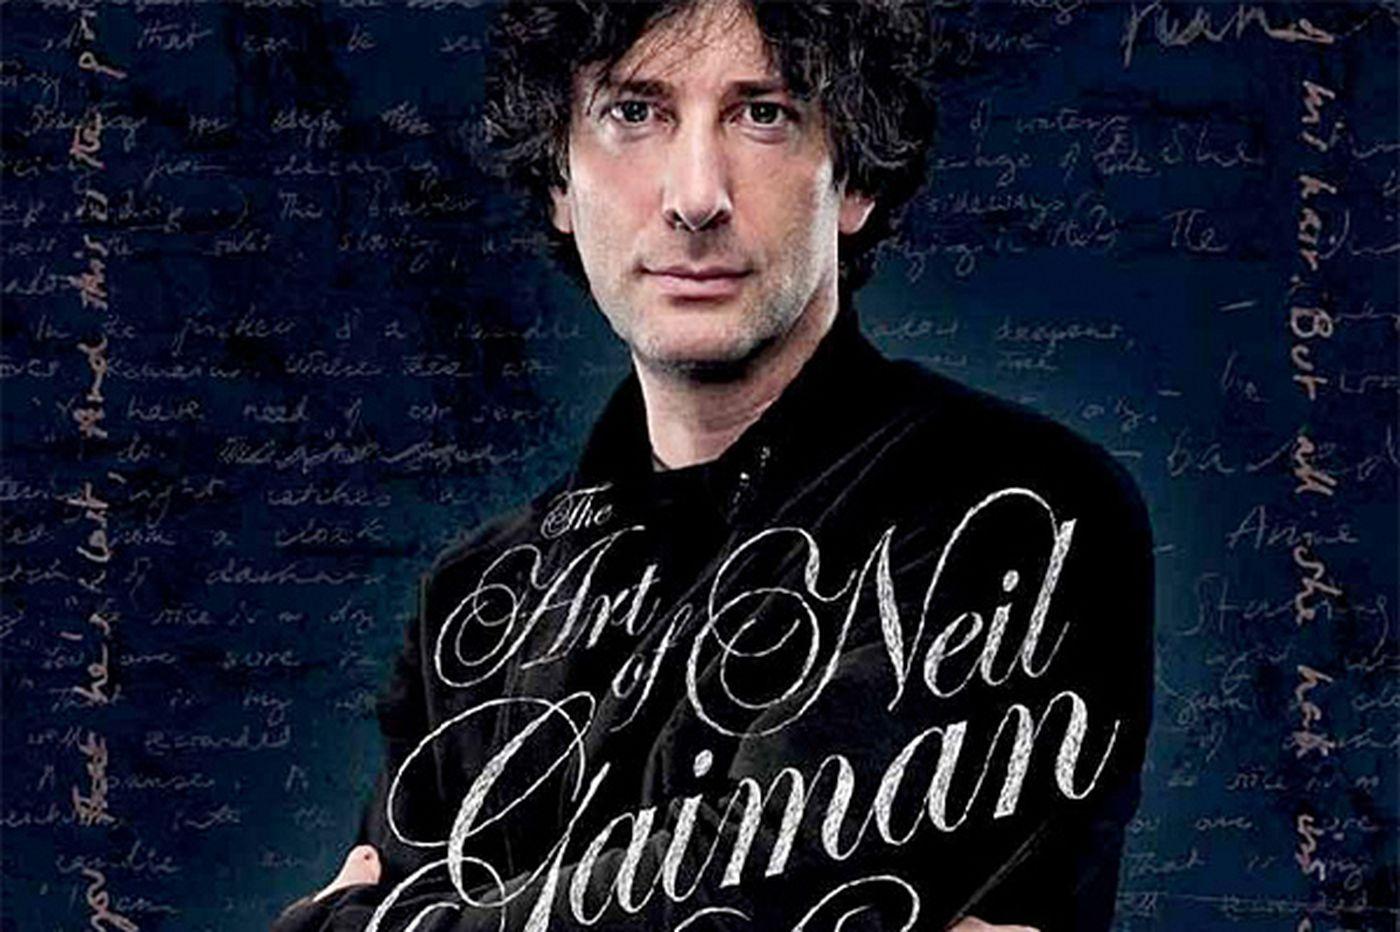 Writer Neil Gaiman: An imagination always at work